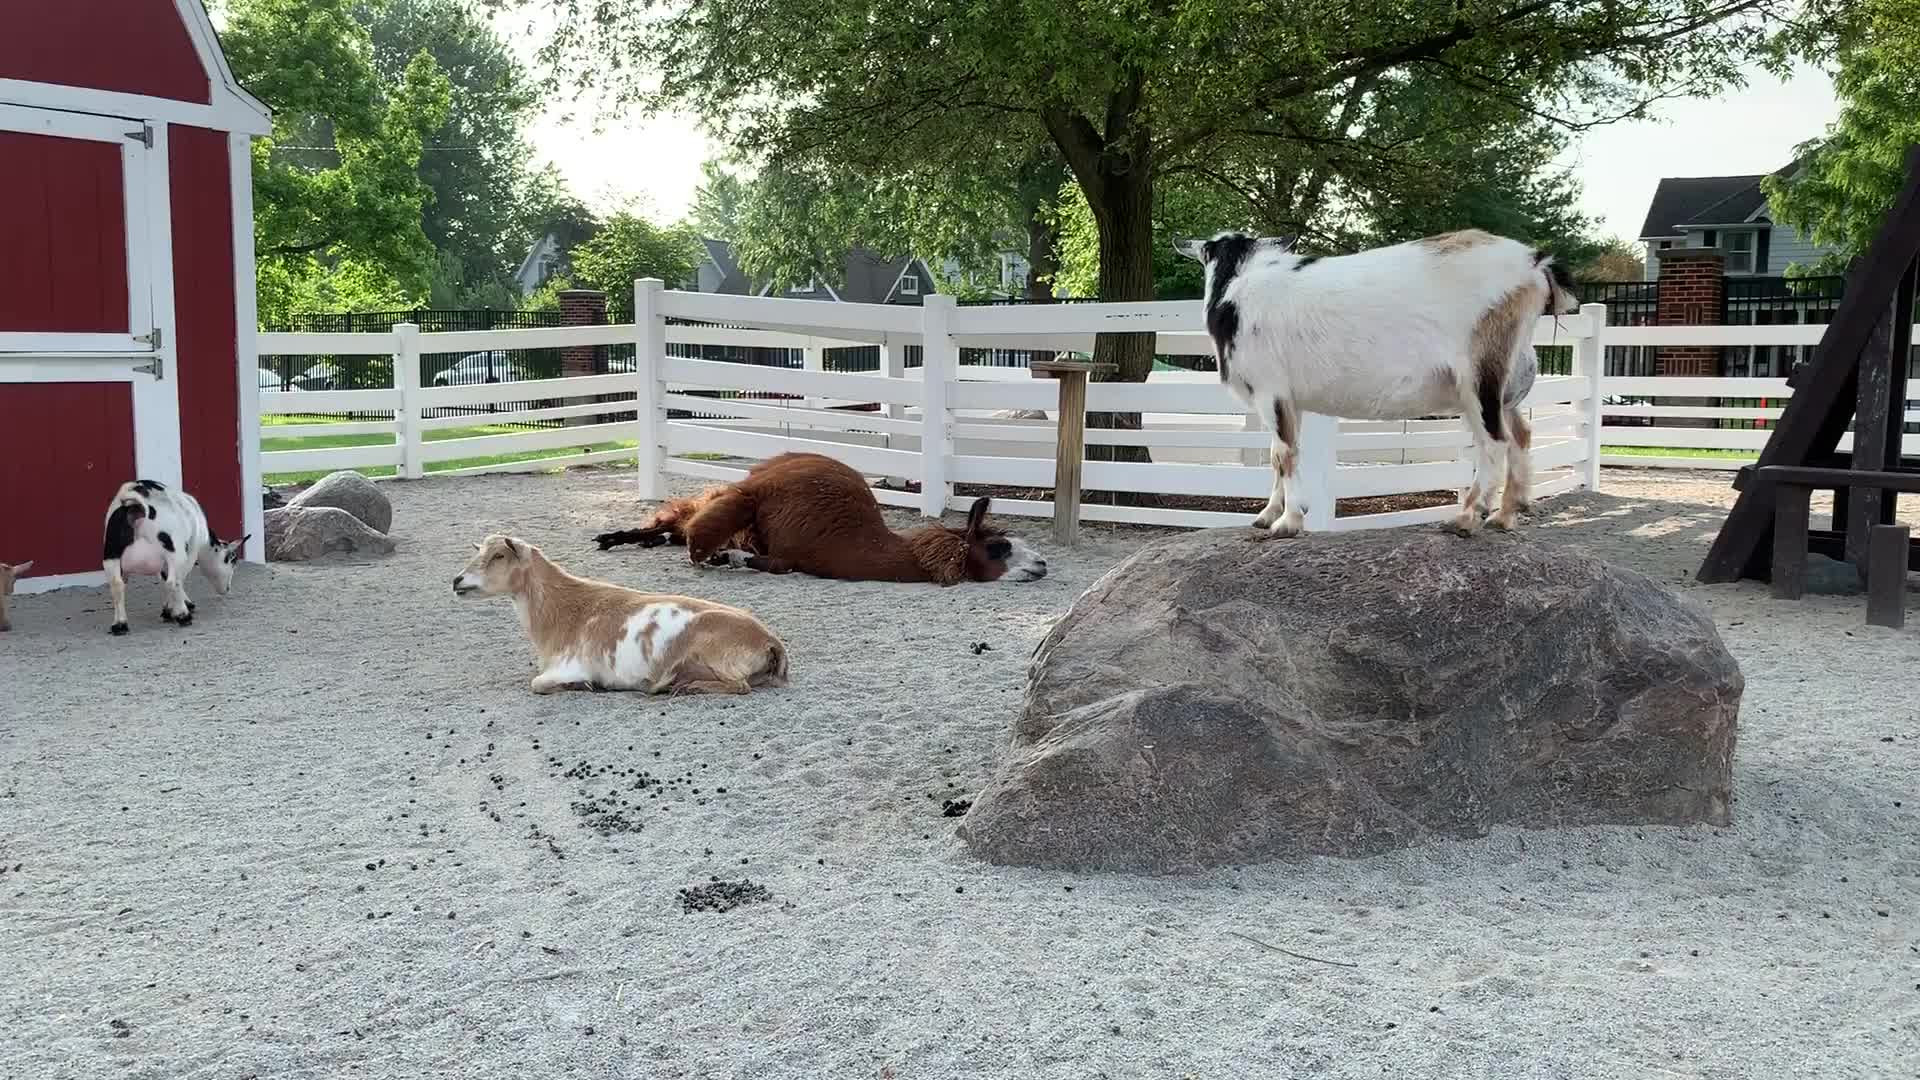 goat parkour, goats,  GIFs